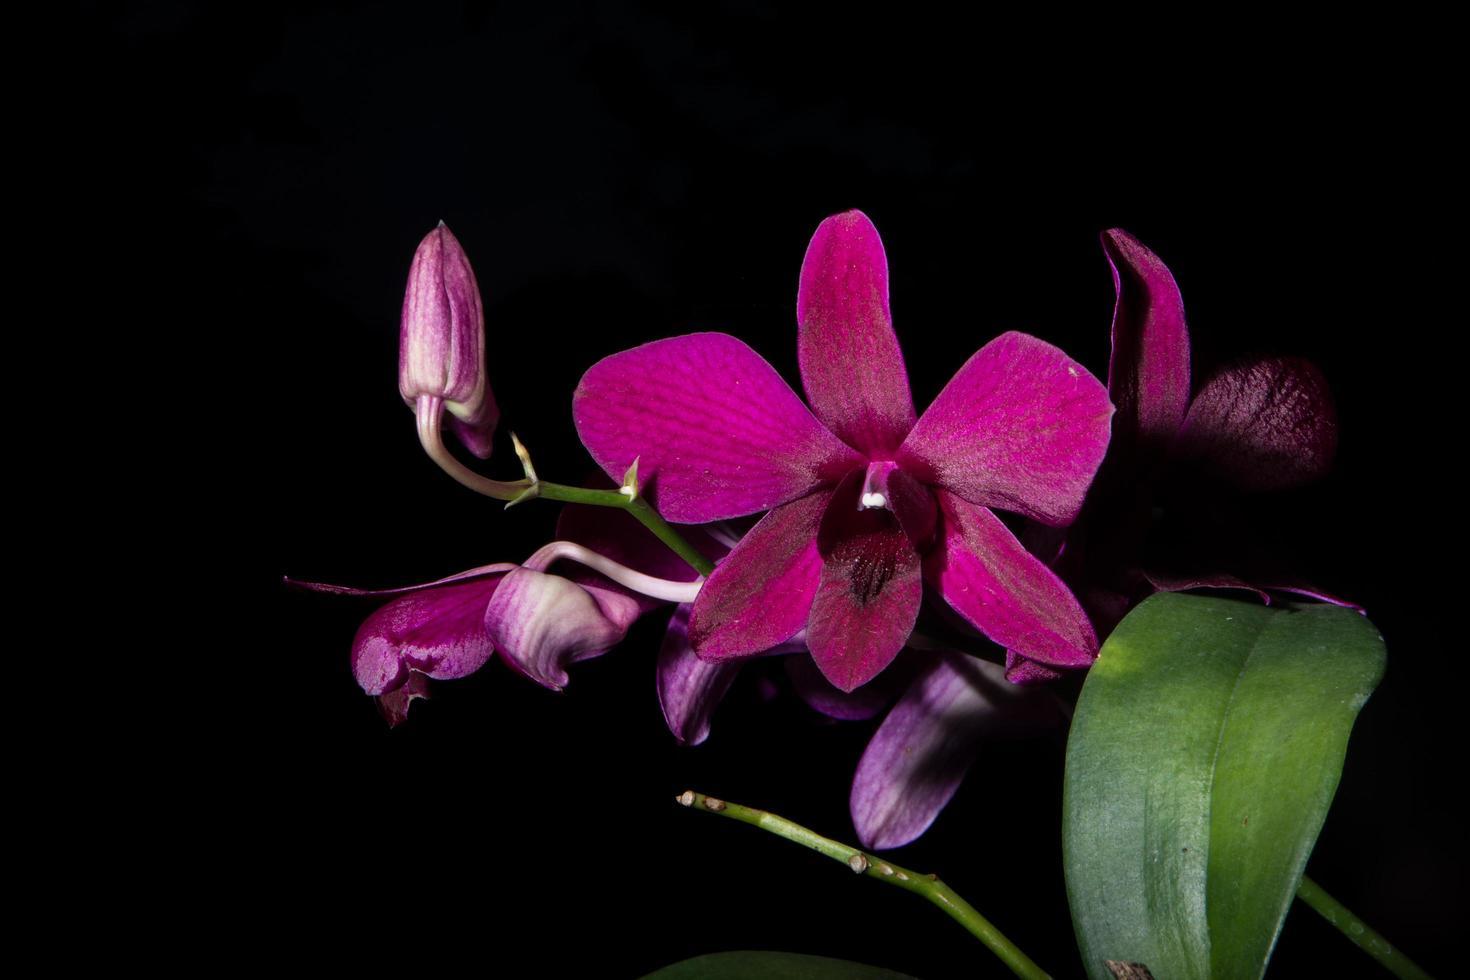 flores violetas sobre fondo negro foto